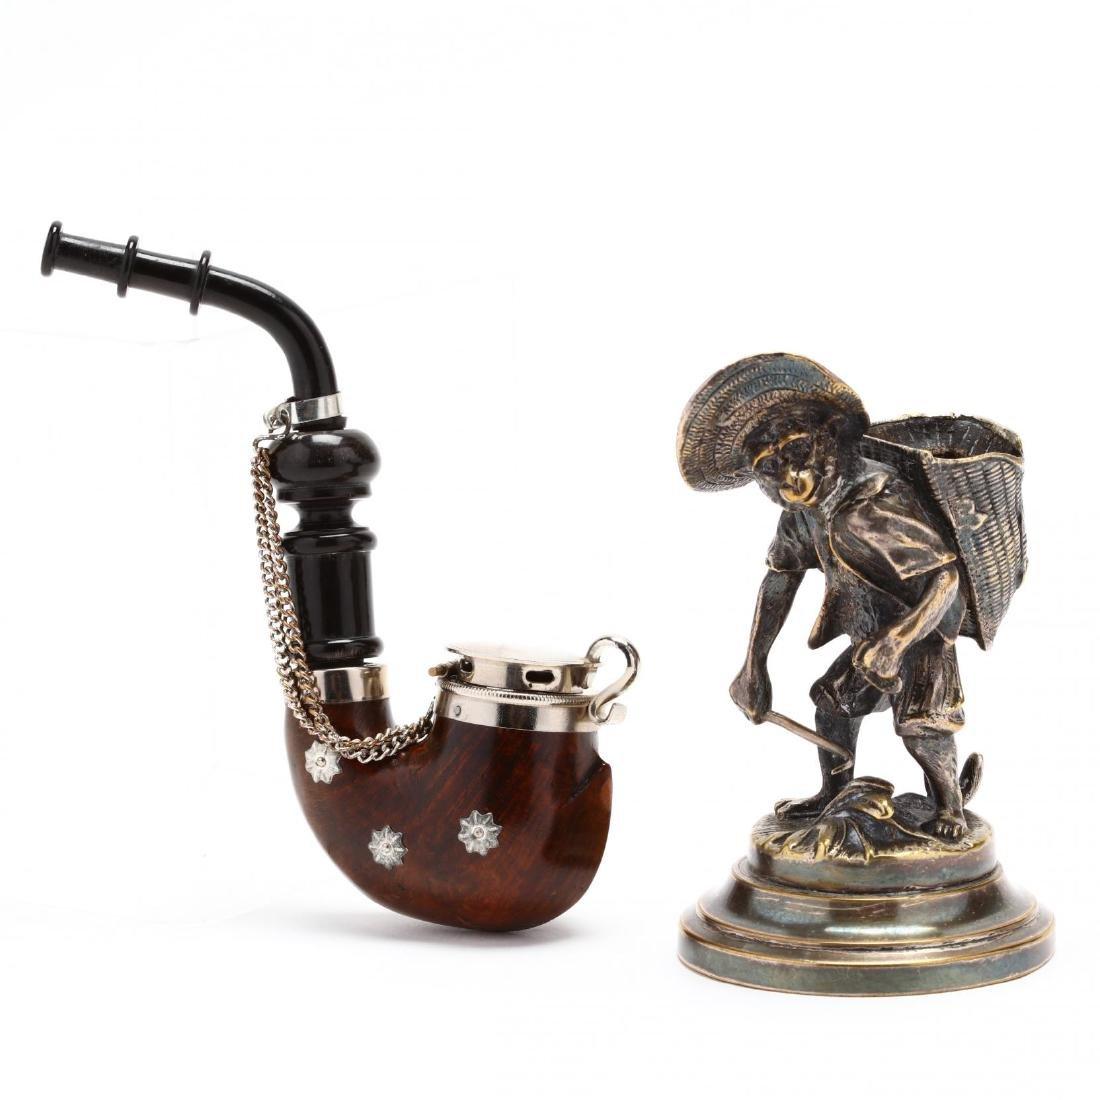 Antique and Vintage Gentleman's Pipe & Match Holder - 2